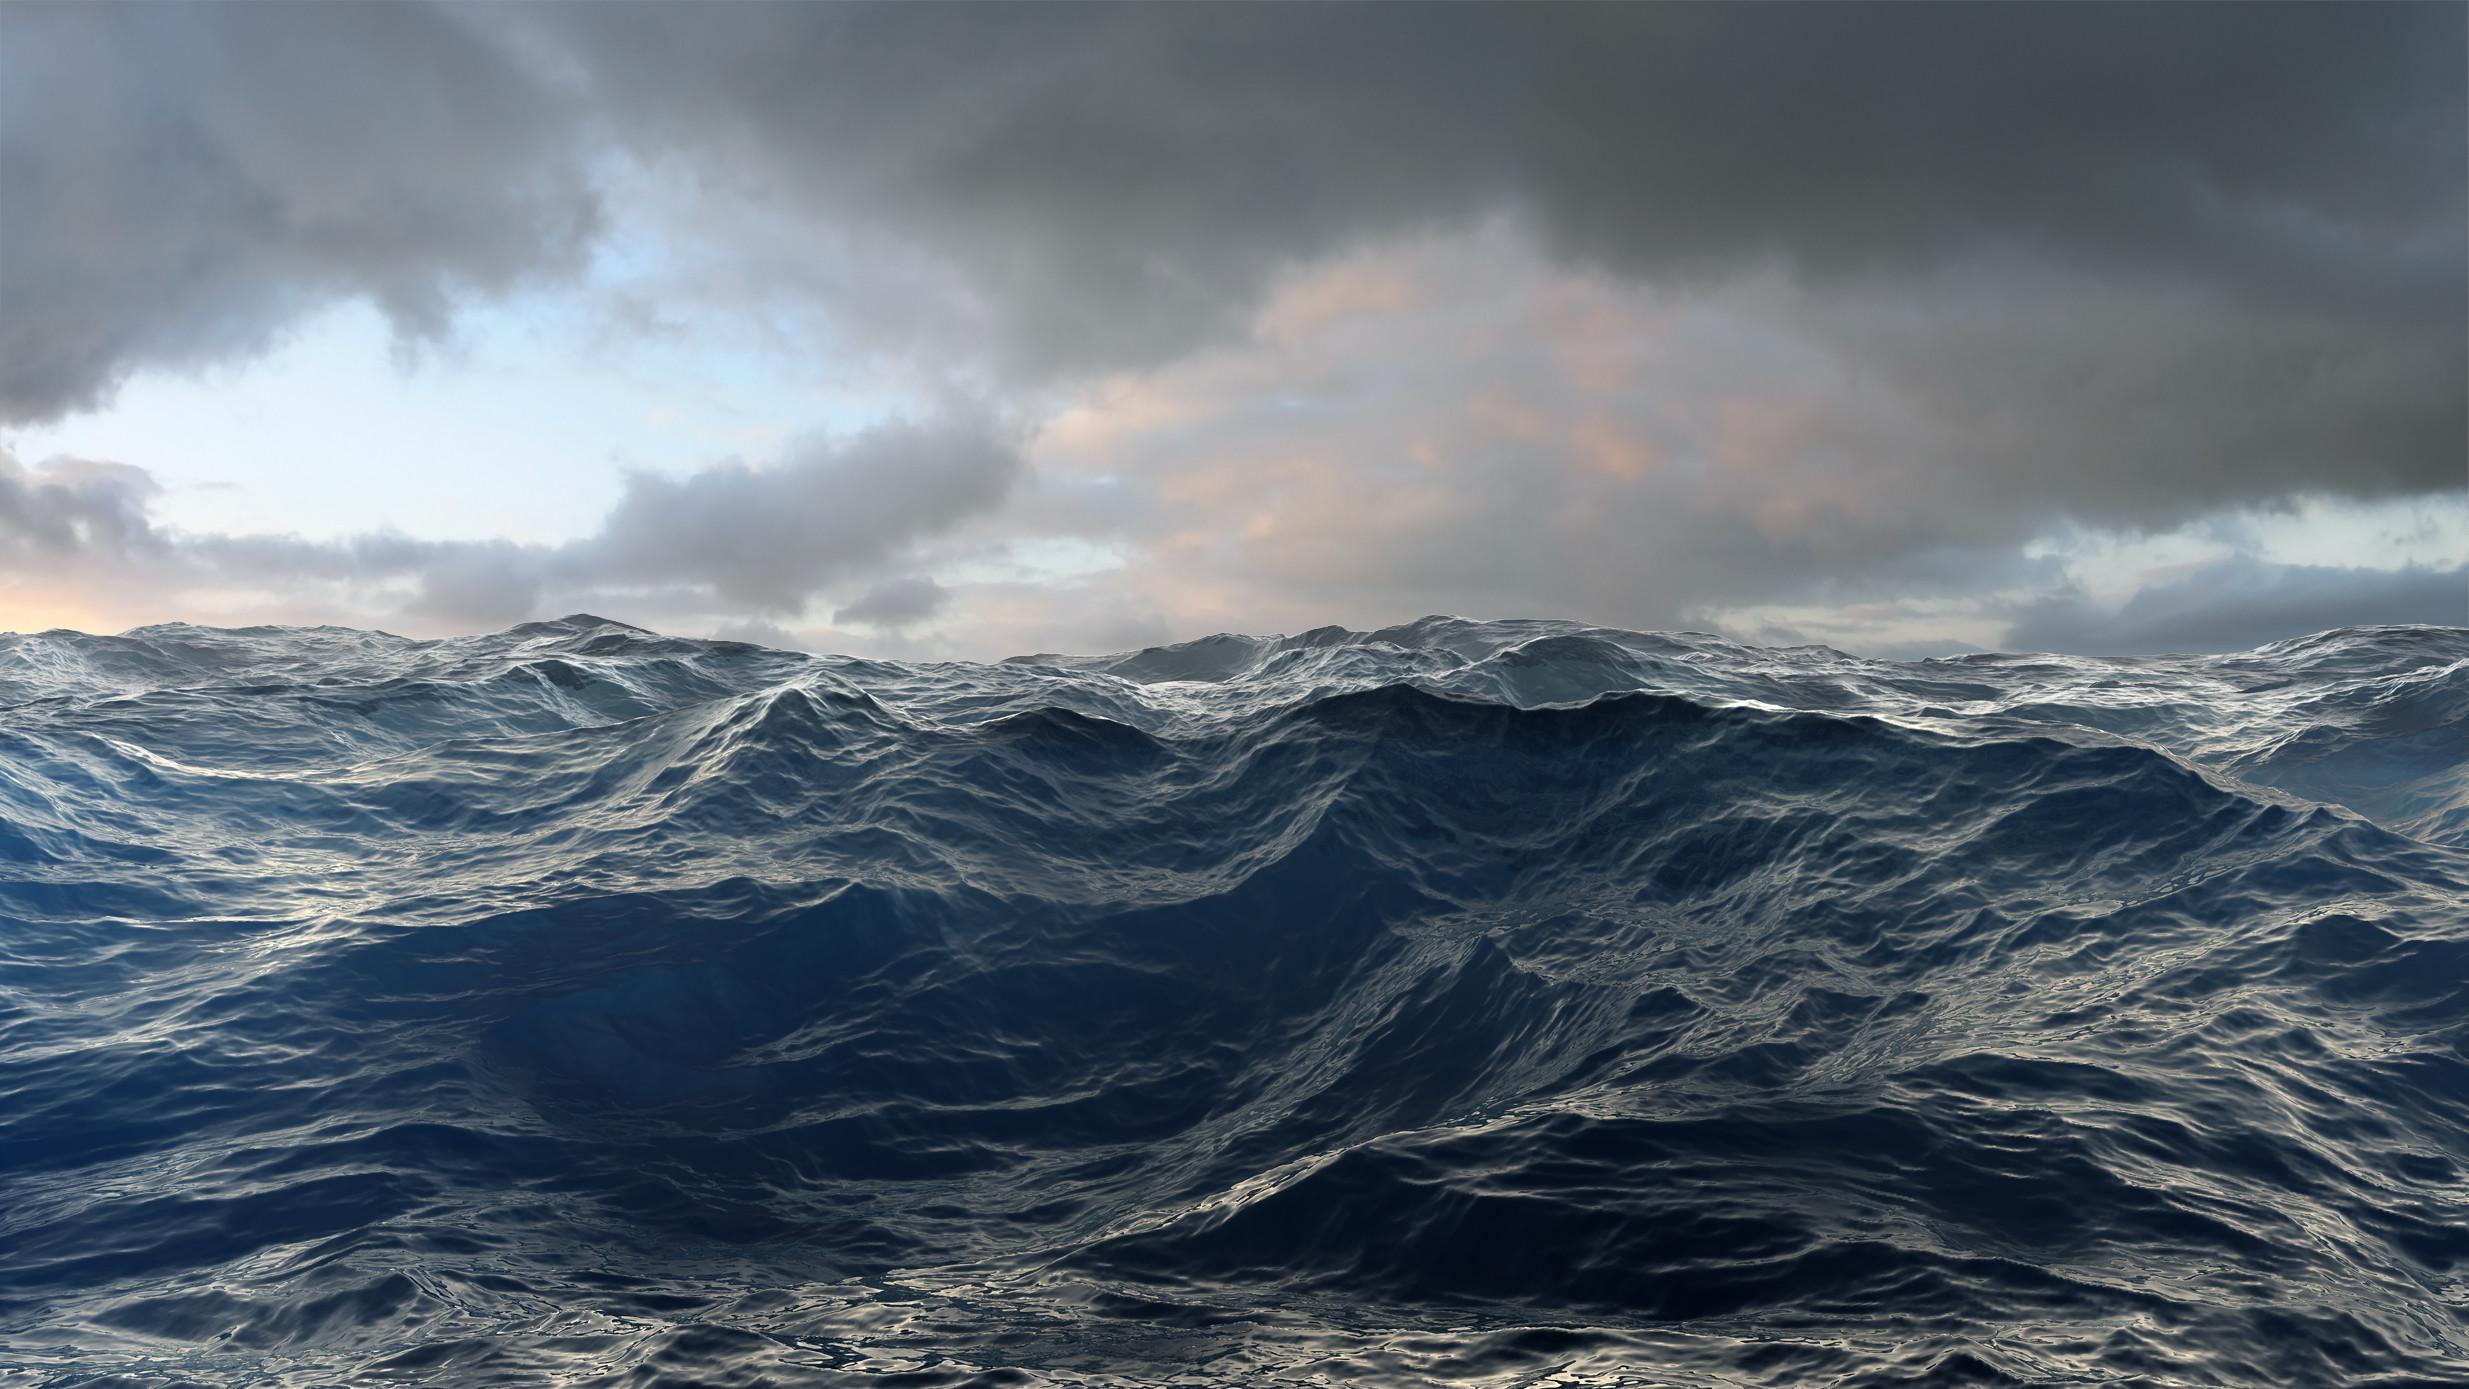 Gerhard+Mantz.+Rough+Seas.+Persönliches+Wagnis+Tinte+auf+Leinwand+140+x+270+cm+2009